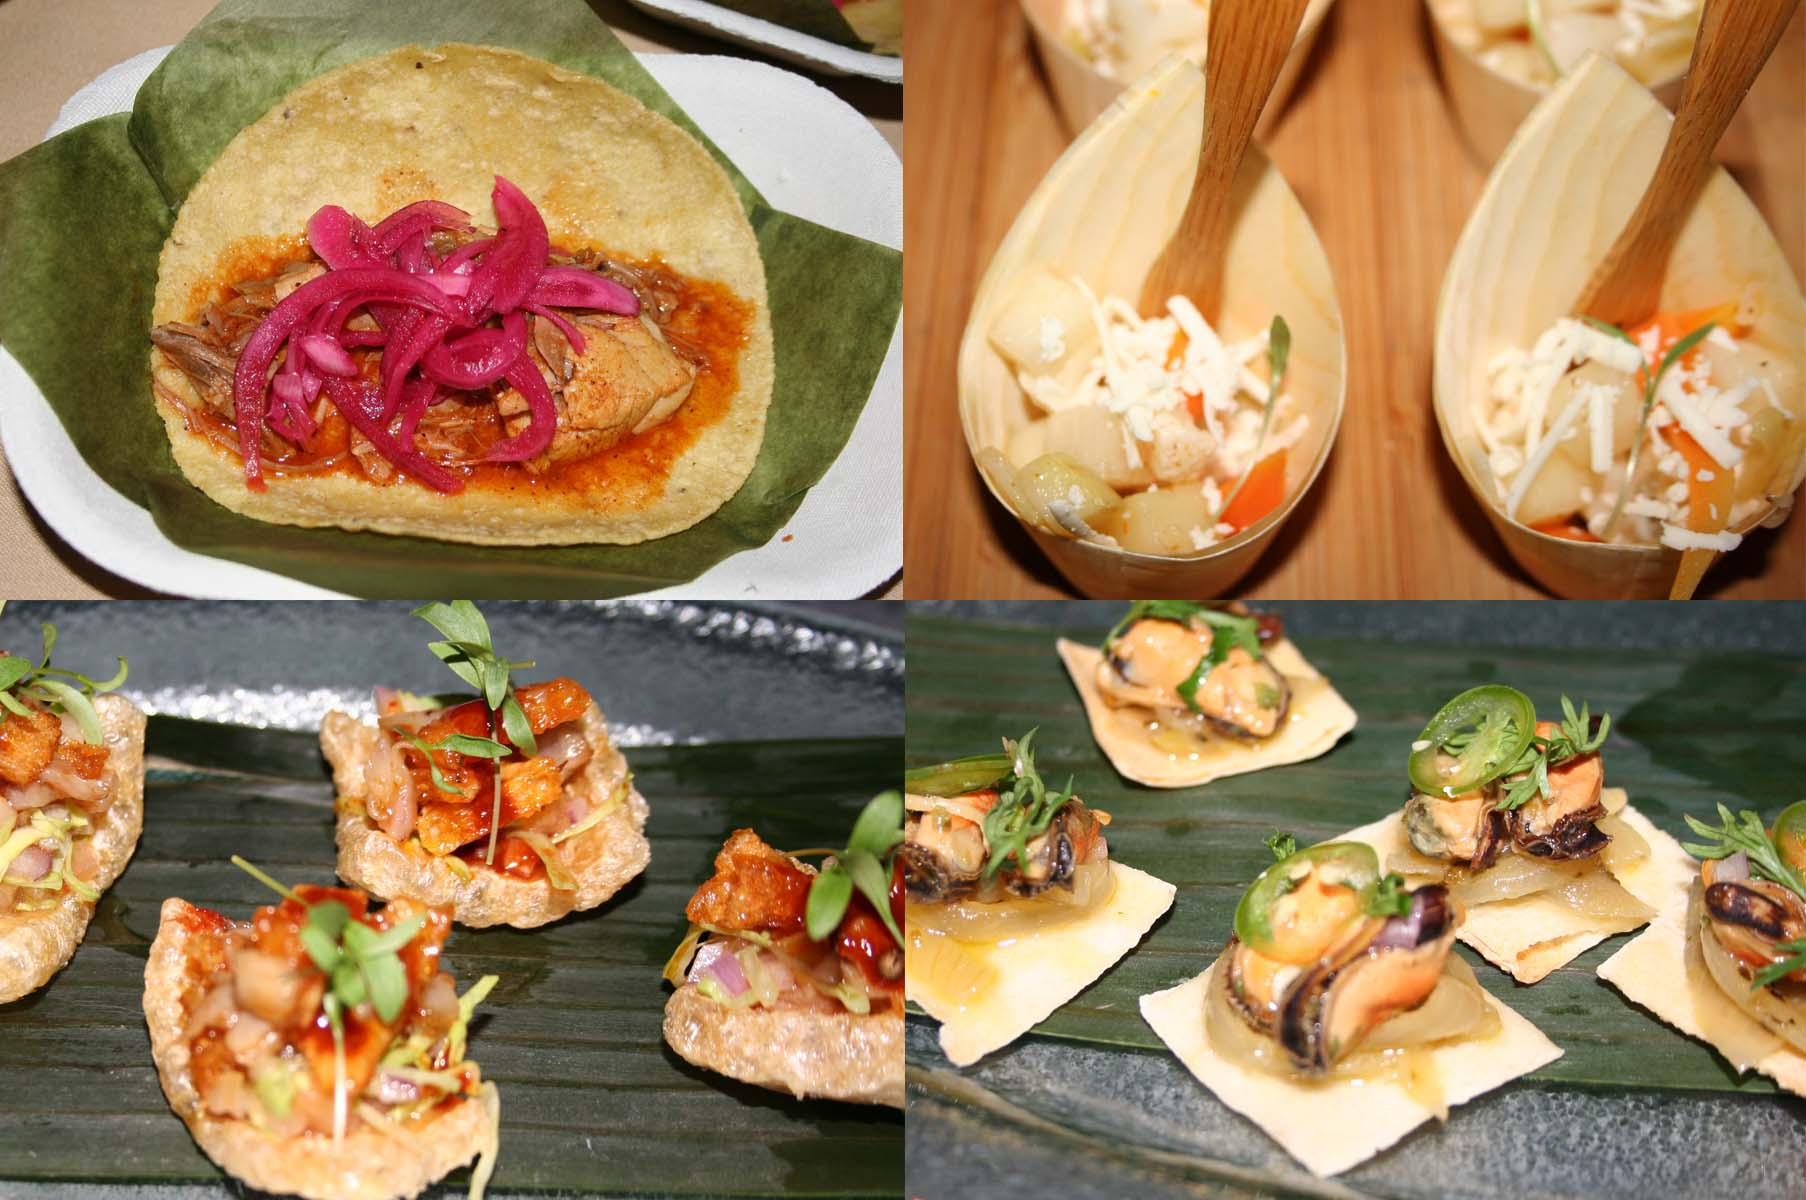 Special dishes include (clockwise from top left) whole baby pig cochinita tacos, encruditos, mejillones escabeche and cueritos. (Photos: Mark Heckathorn/DC on Heels)